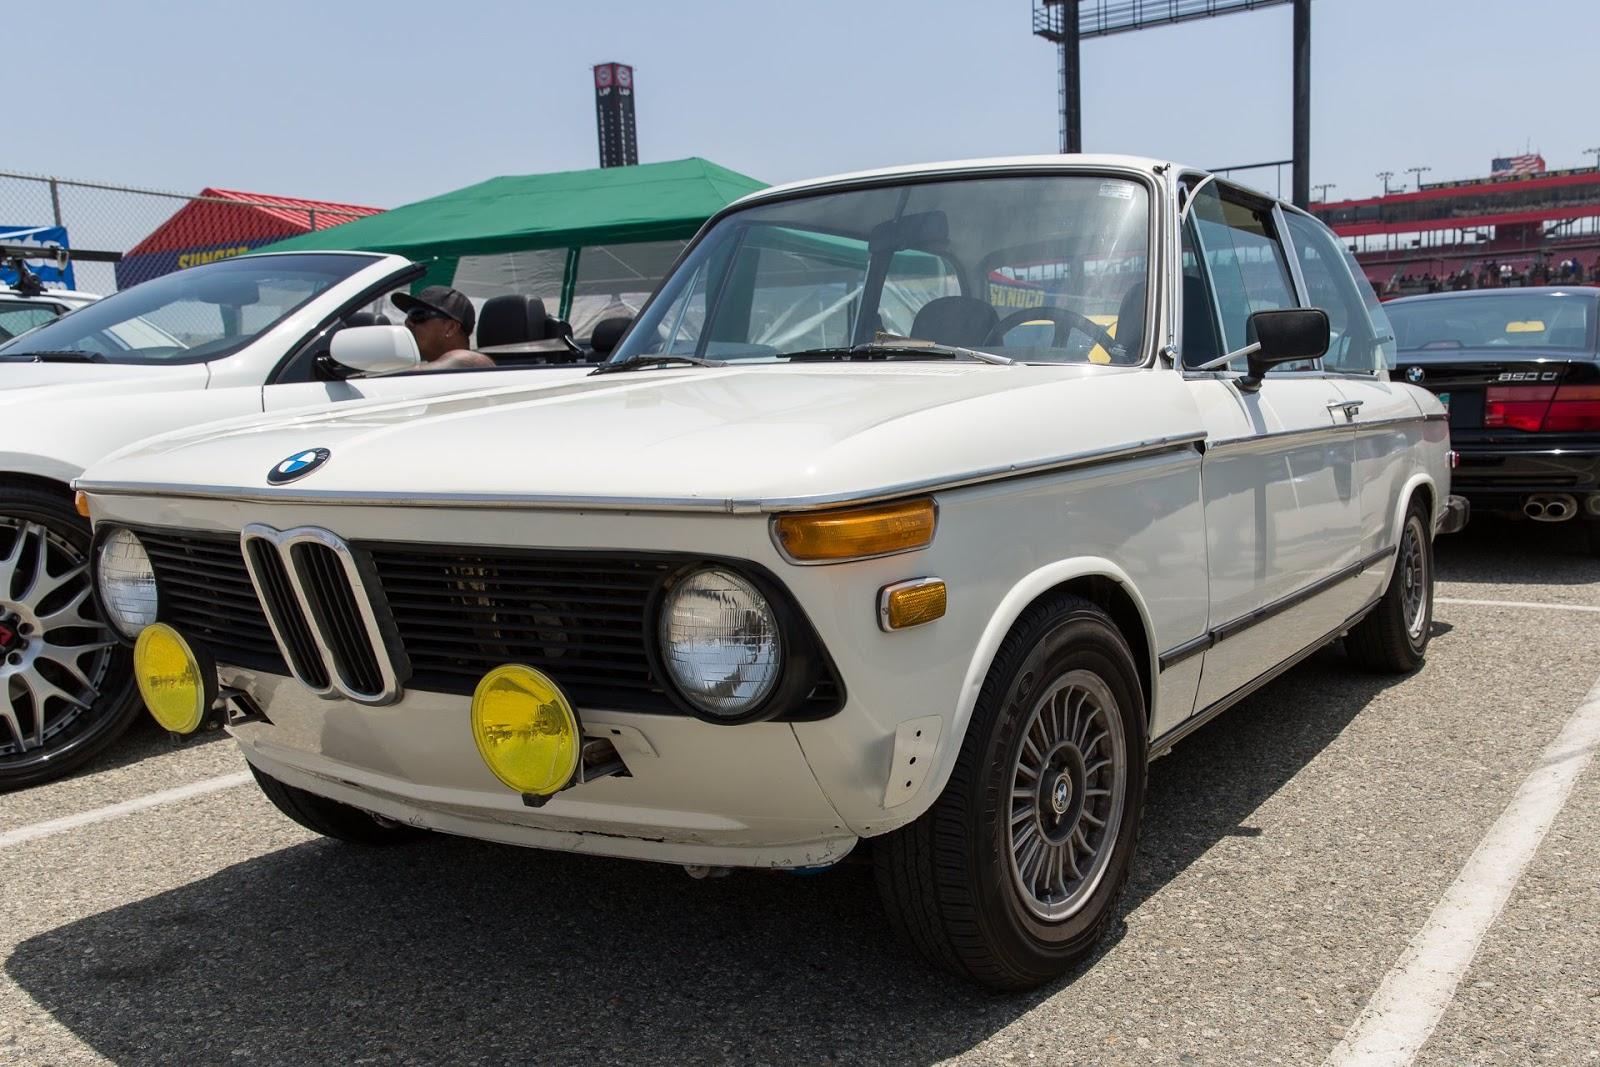 BMW 2002 Early Euro Bumper Seam Covers REAR